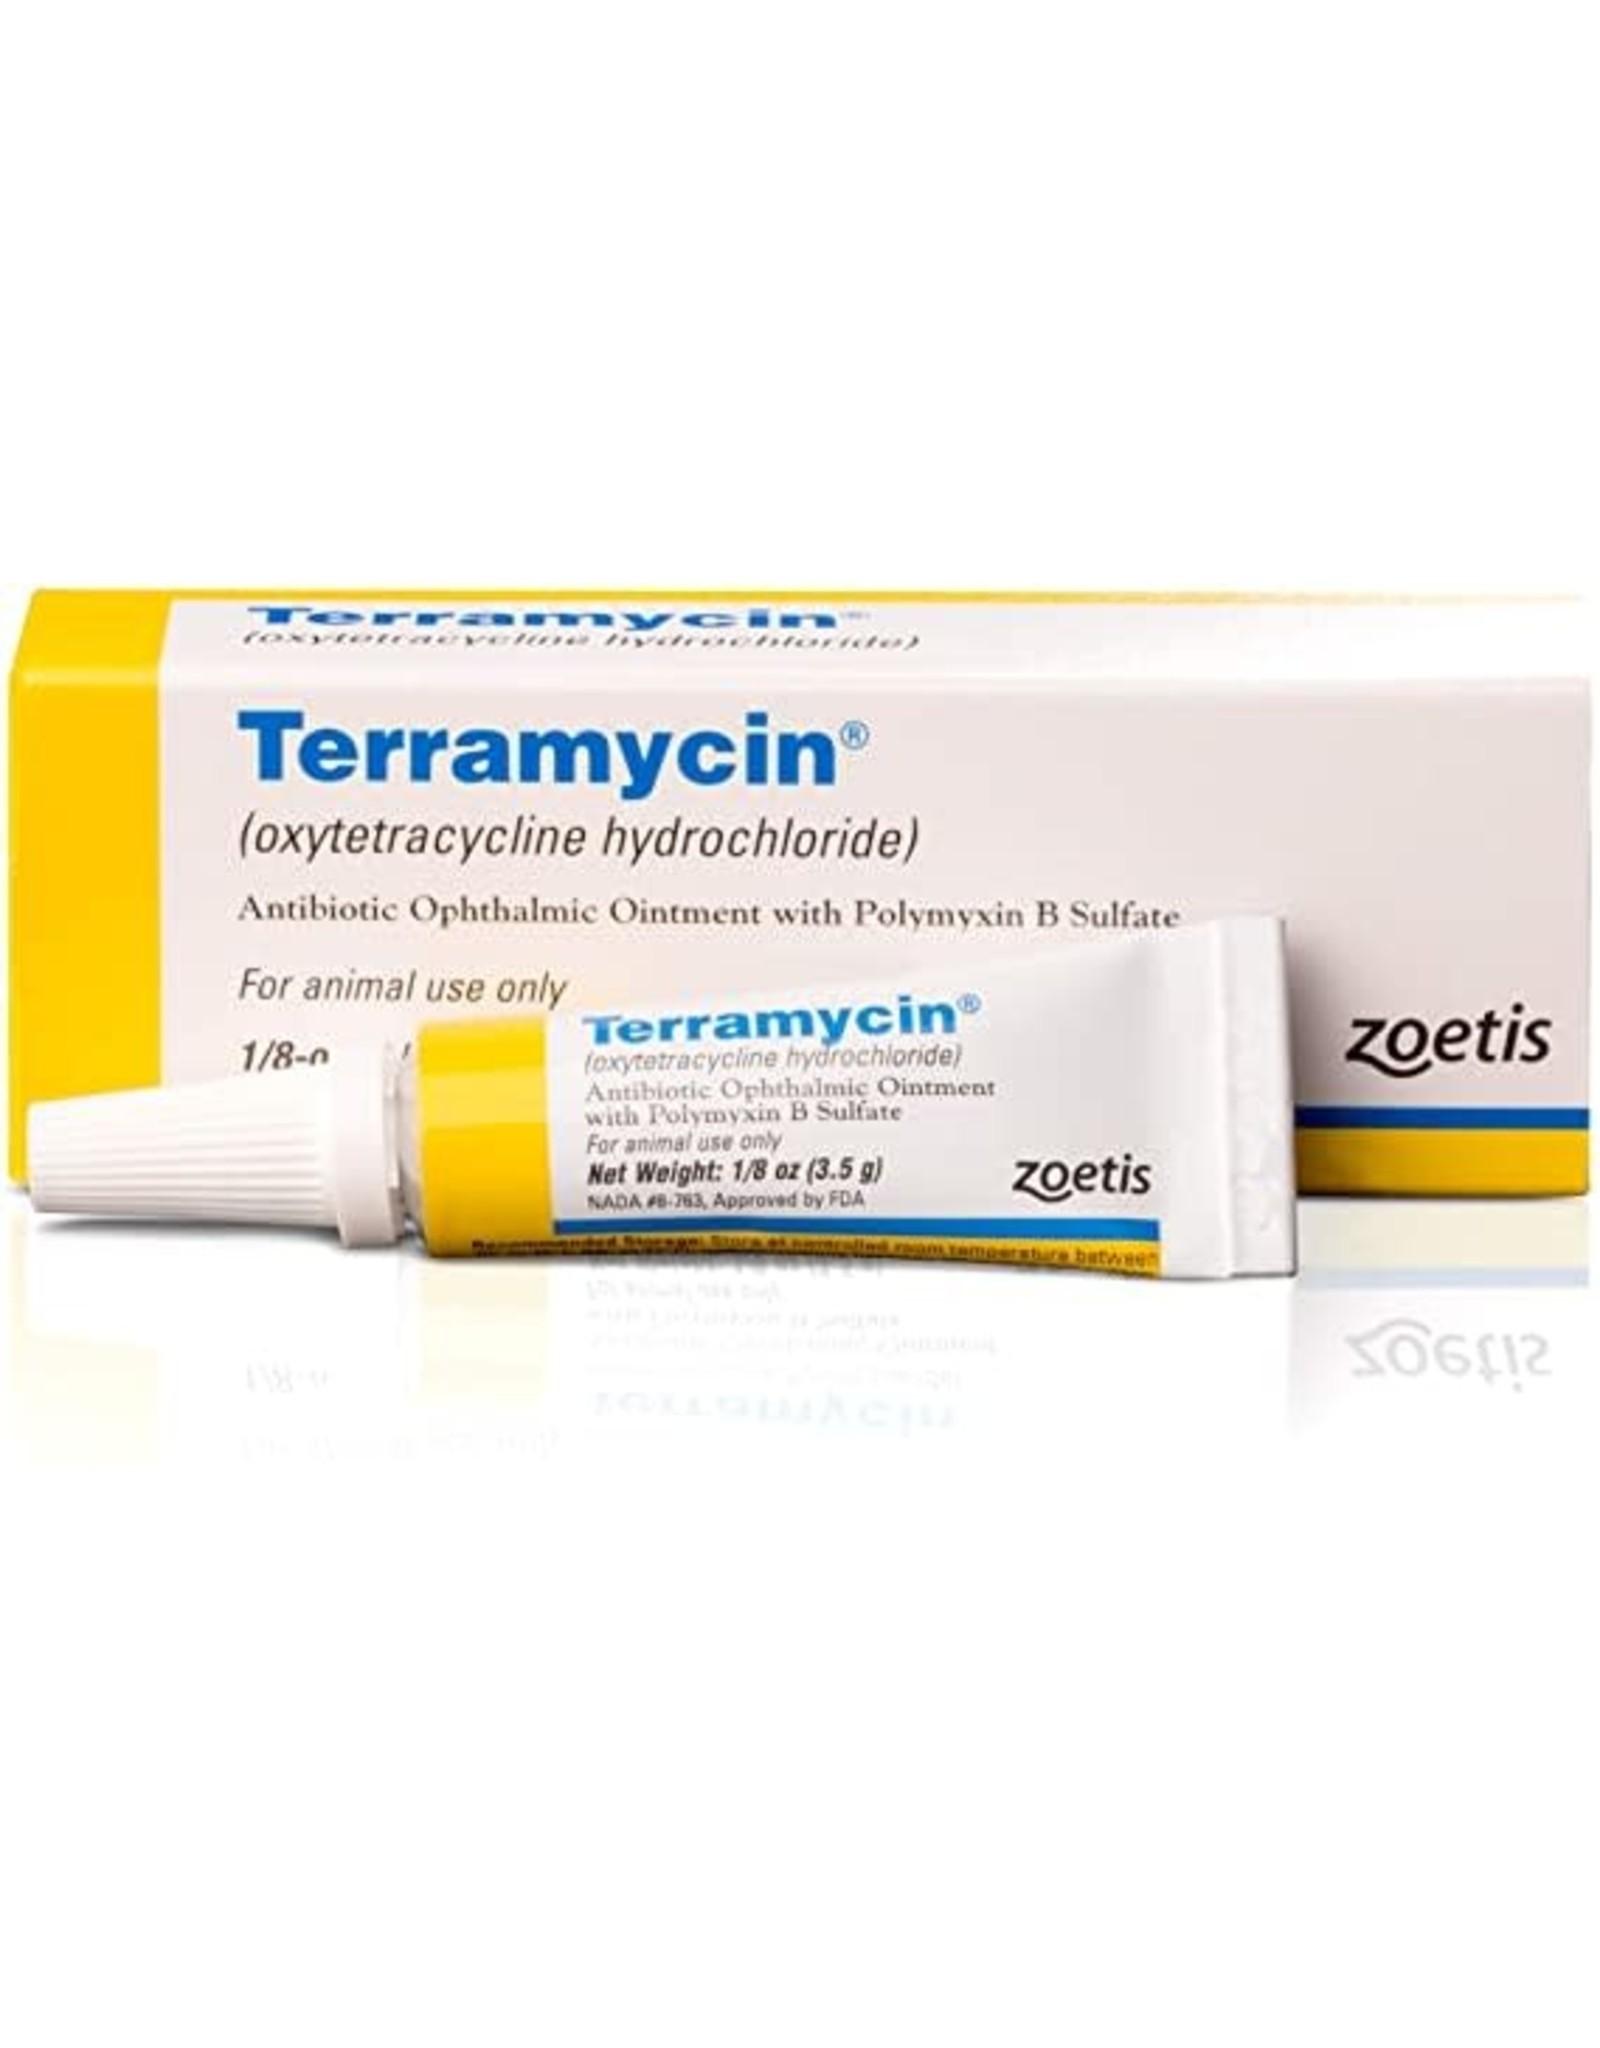 Terramycin Eye Ointment 1/8 oz